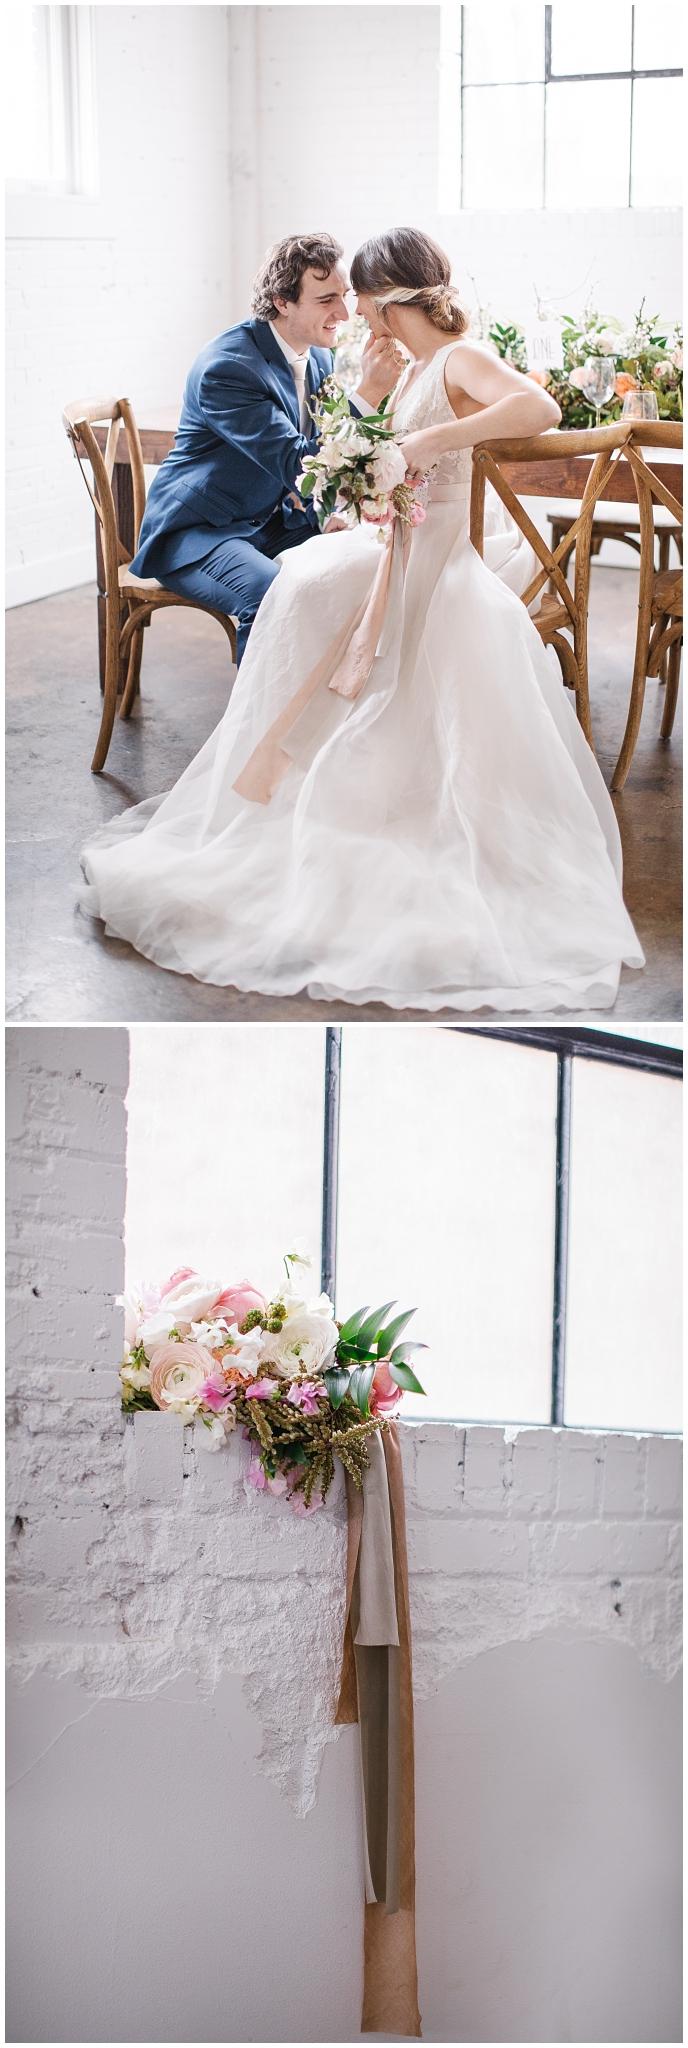 Styled Shoot2-17-101_Lizzie-B-Imagery-Utah-Wedding-Photographer-Park-City-Salt-Lake-City-Charcoal-Loft-Studio.jpg